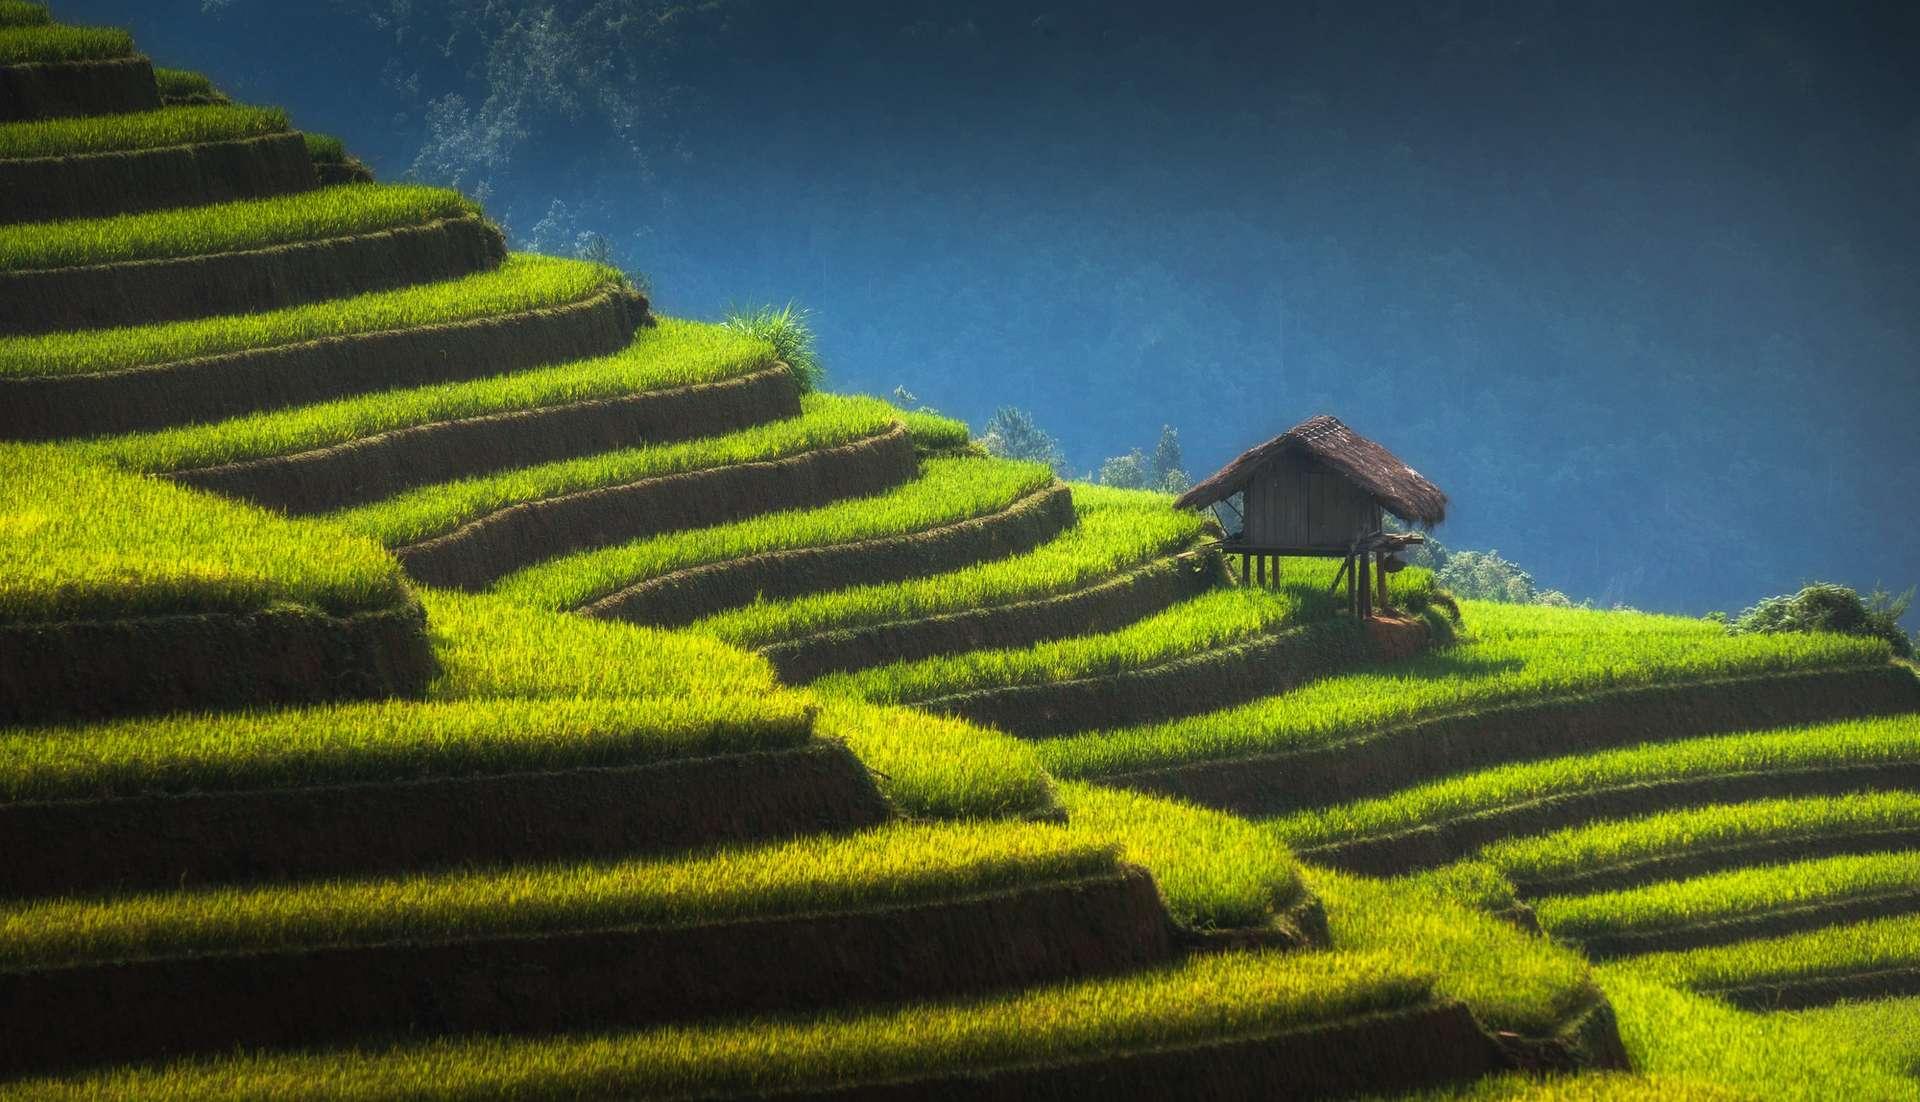 Home on terraced rice field in Vietnam